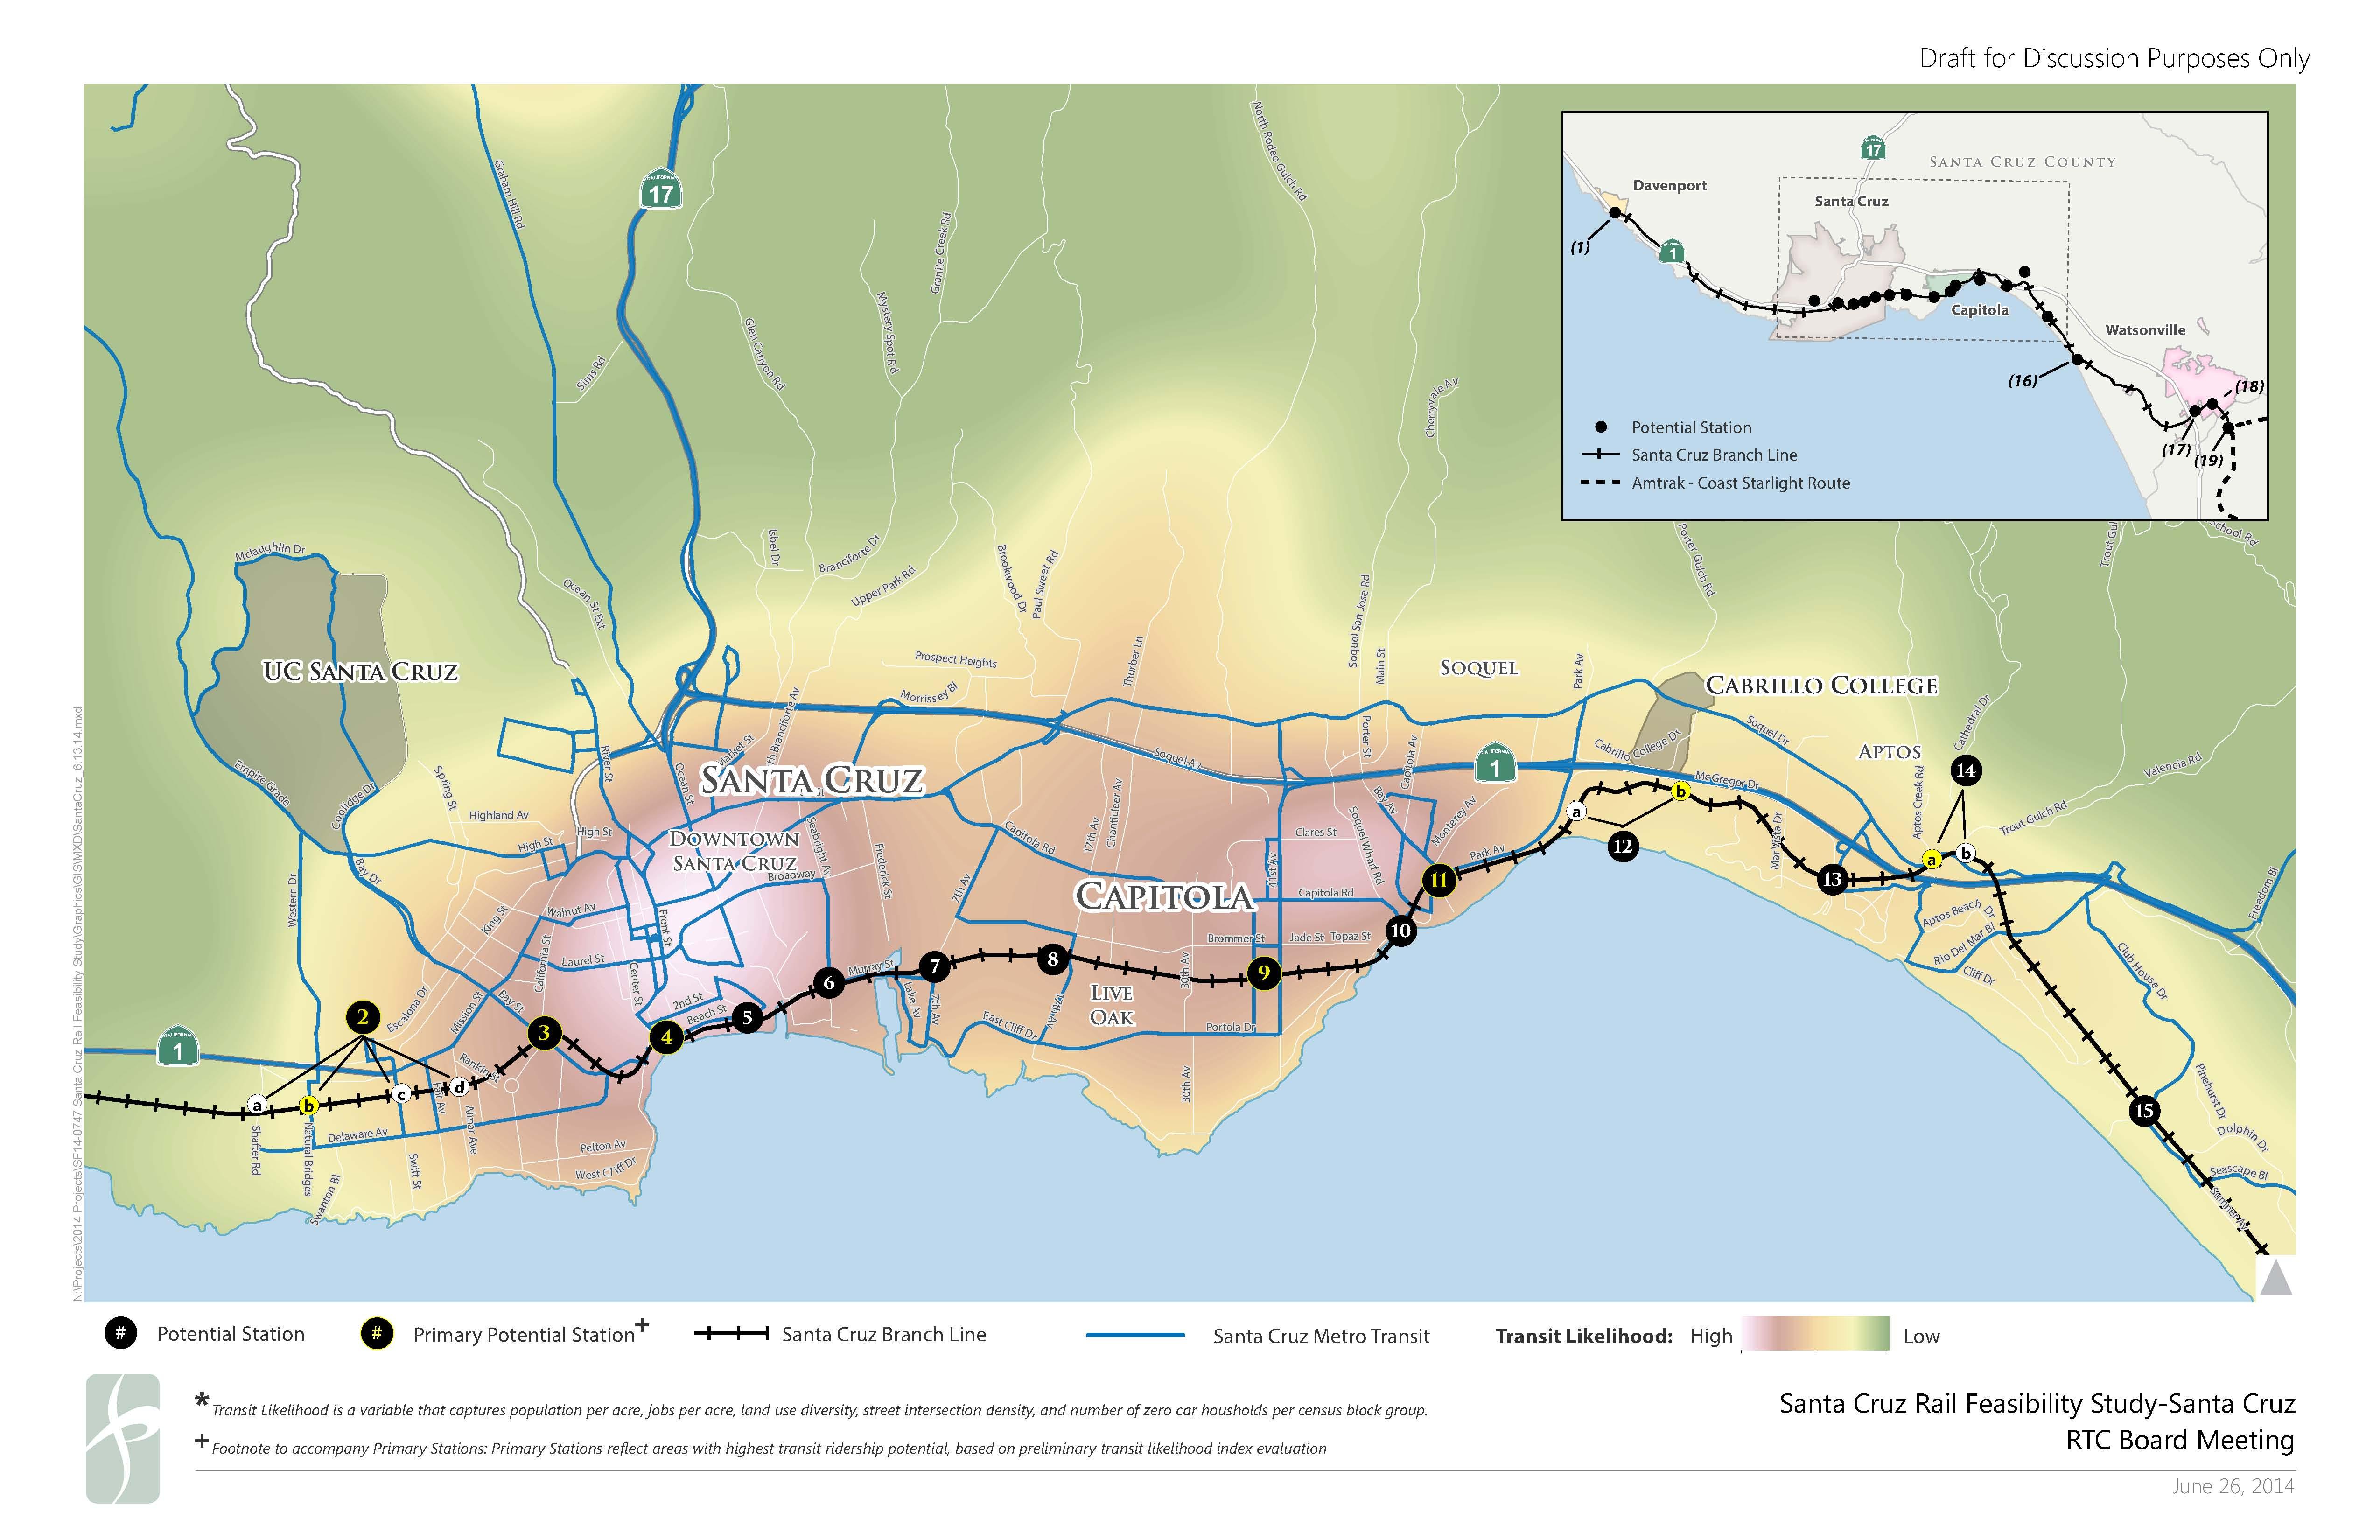 Passenger rail scenarios - Santa Cruz